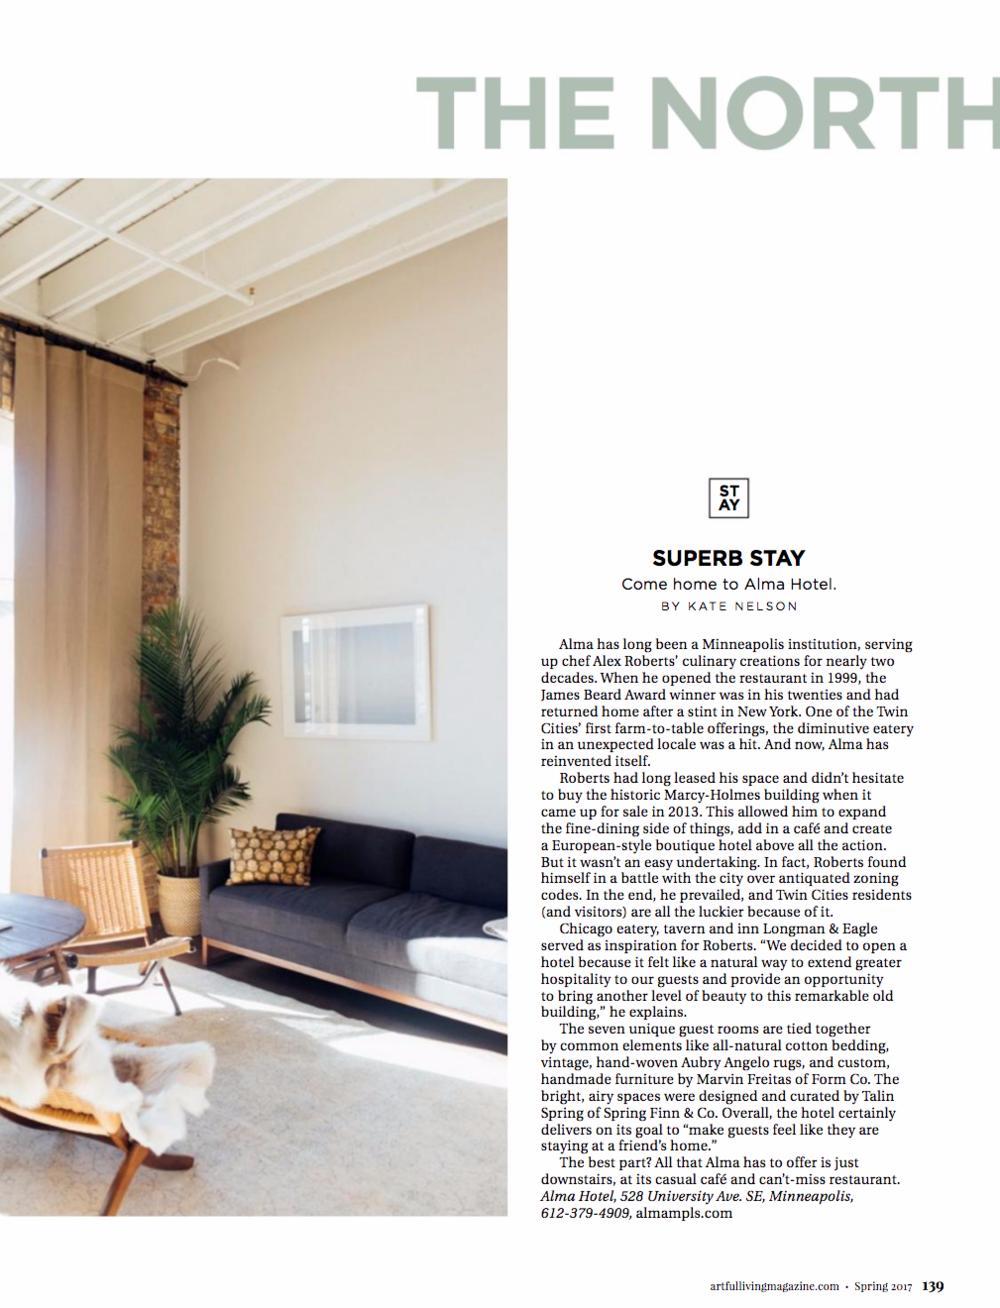 Artful Living, Spring 2017 Issue